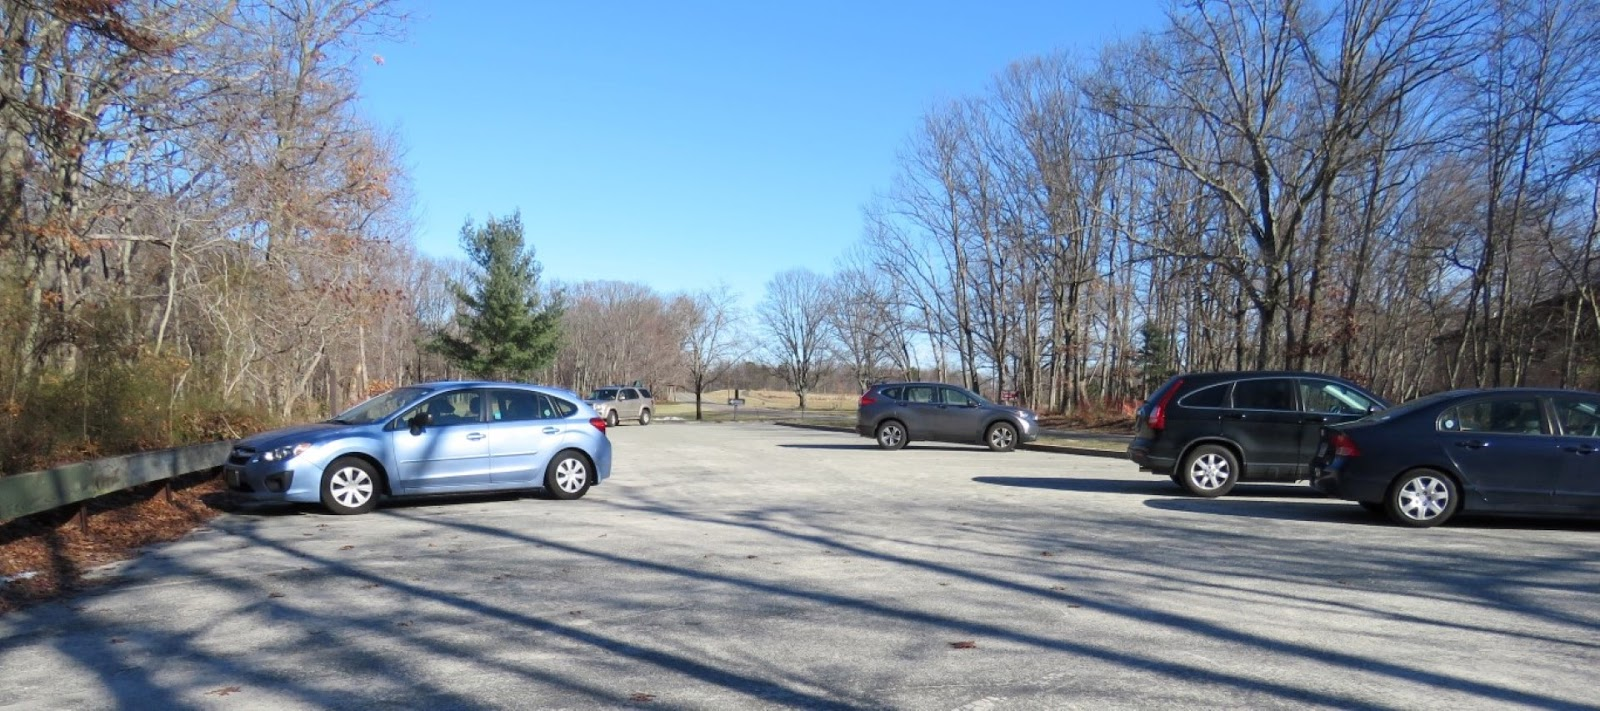 Gone Hikin': Cheesequake State Park, NJ - Yellow and Blue